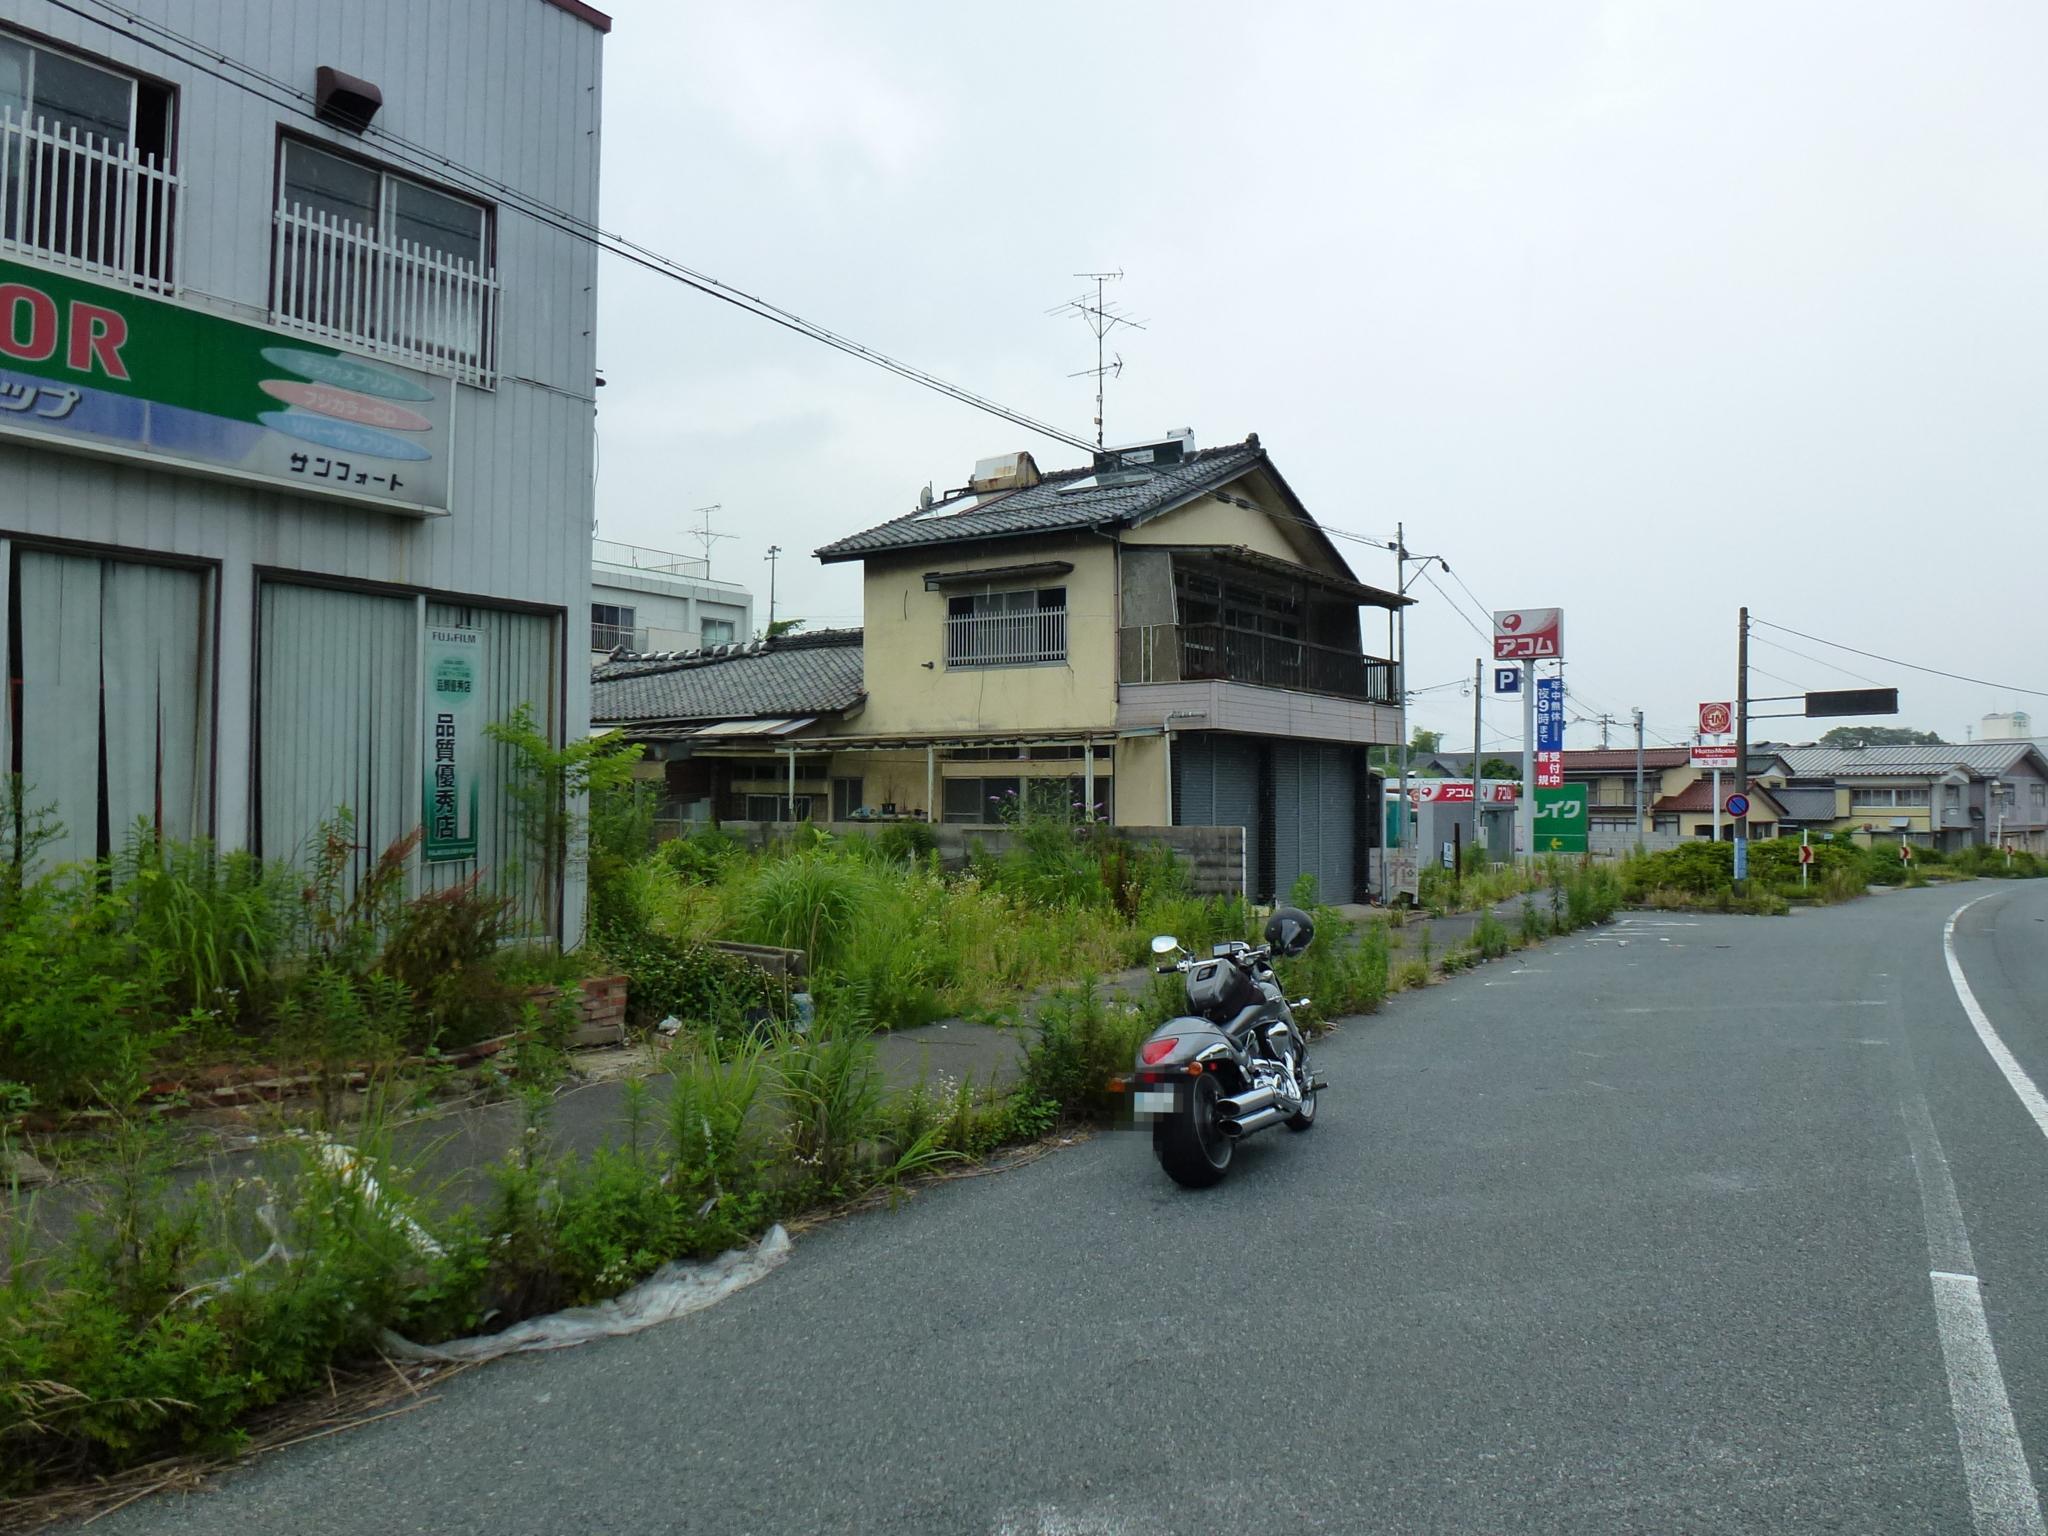 f:id:ToshUeno:20130714132845j:plain